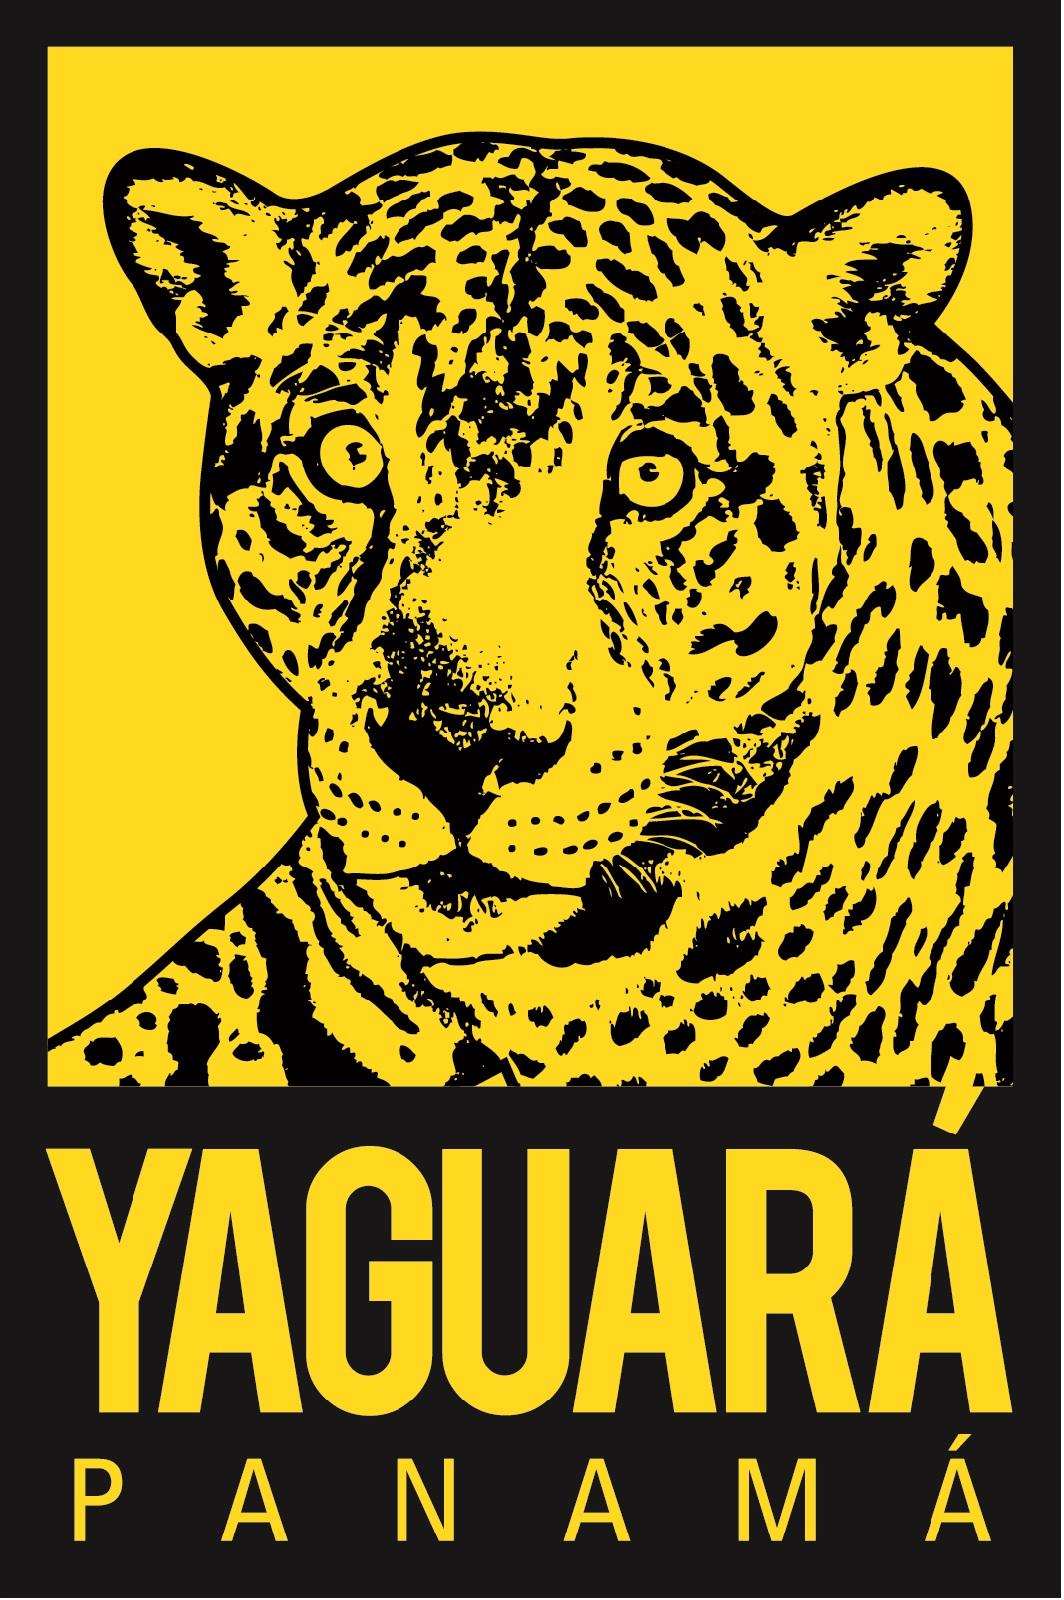 Fundación Yaguará Panamá